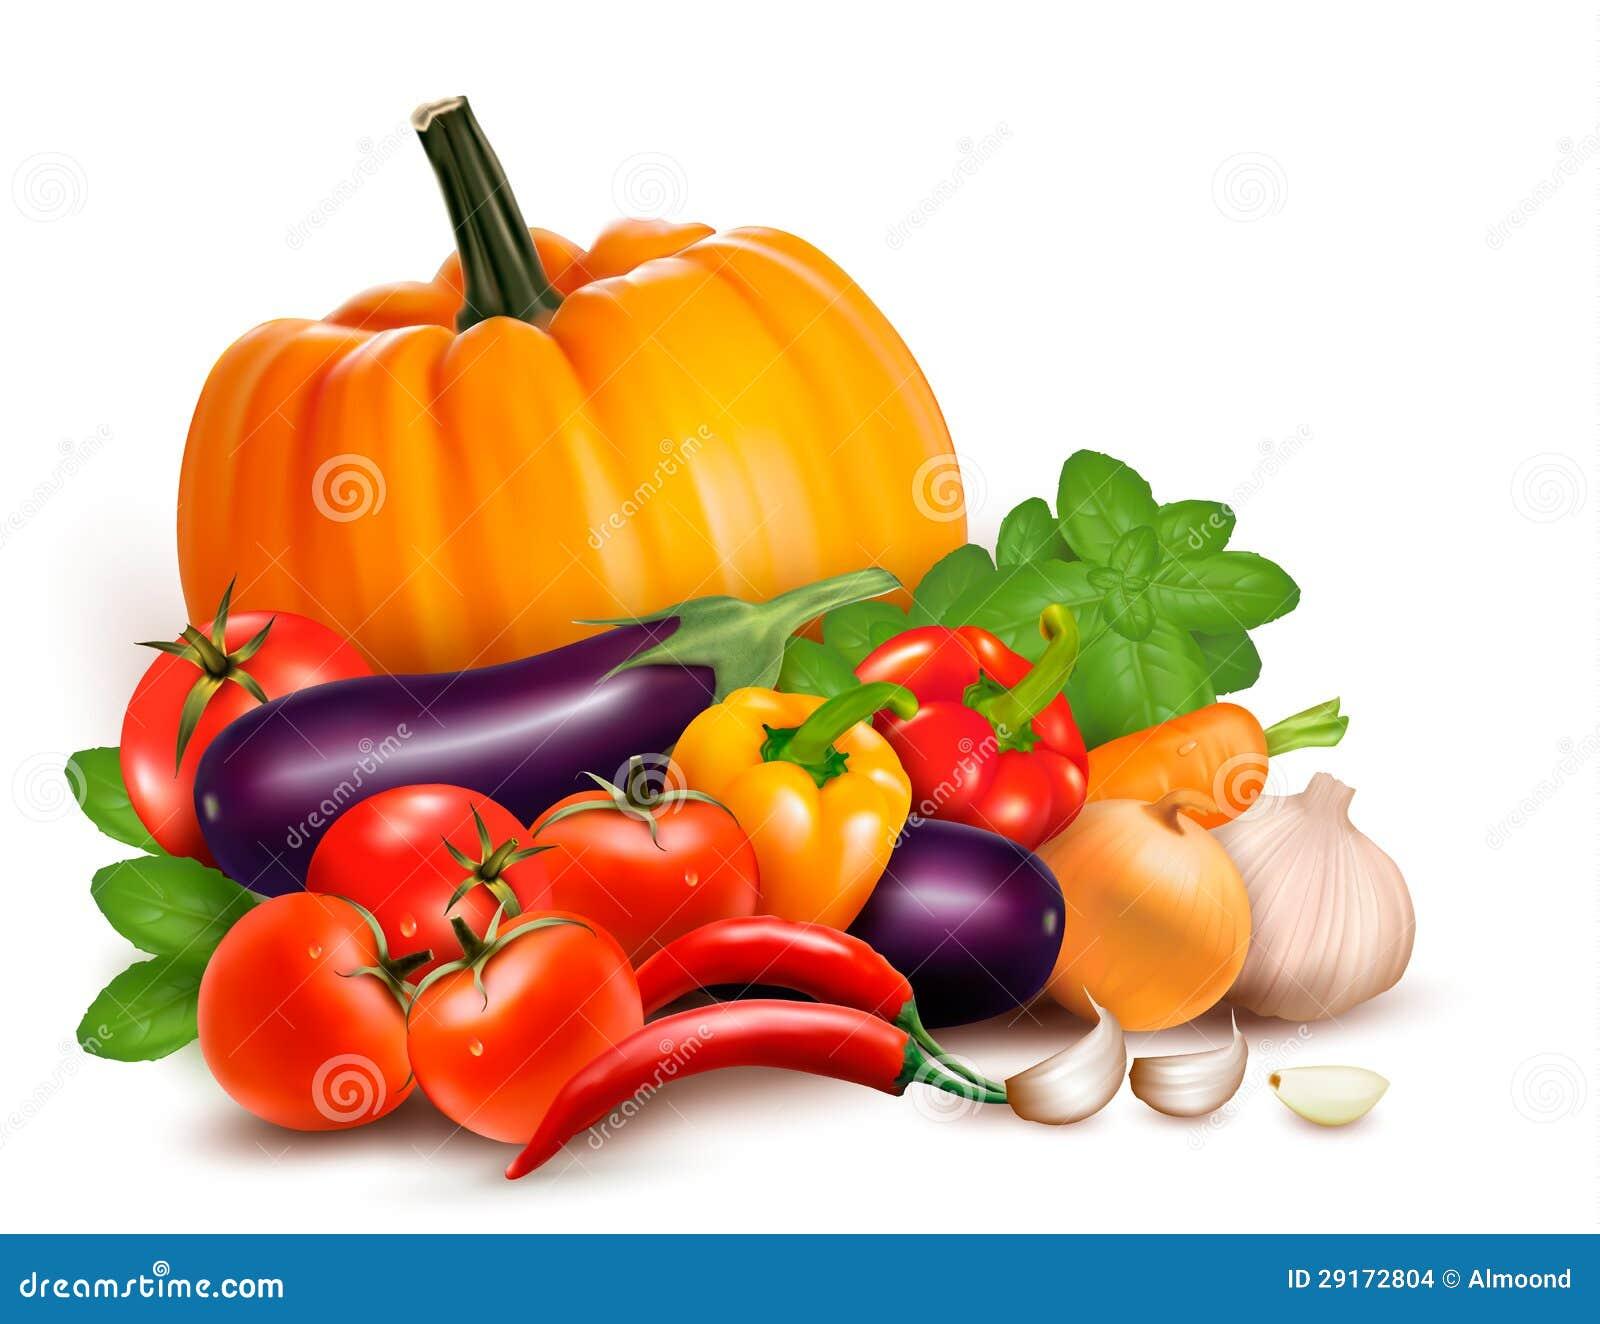 Verduras frescas comida sana imagenes de archivo for Cocinar comida sana